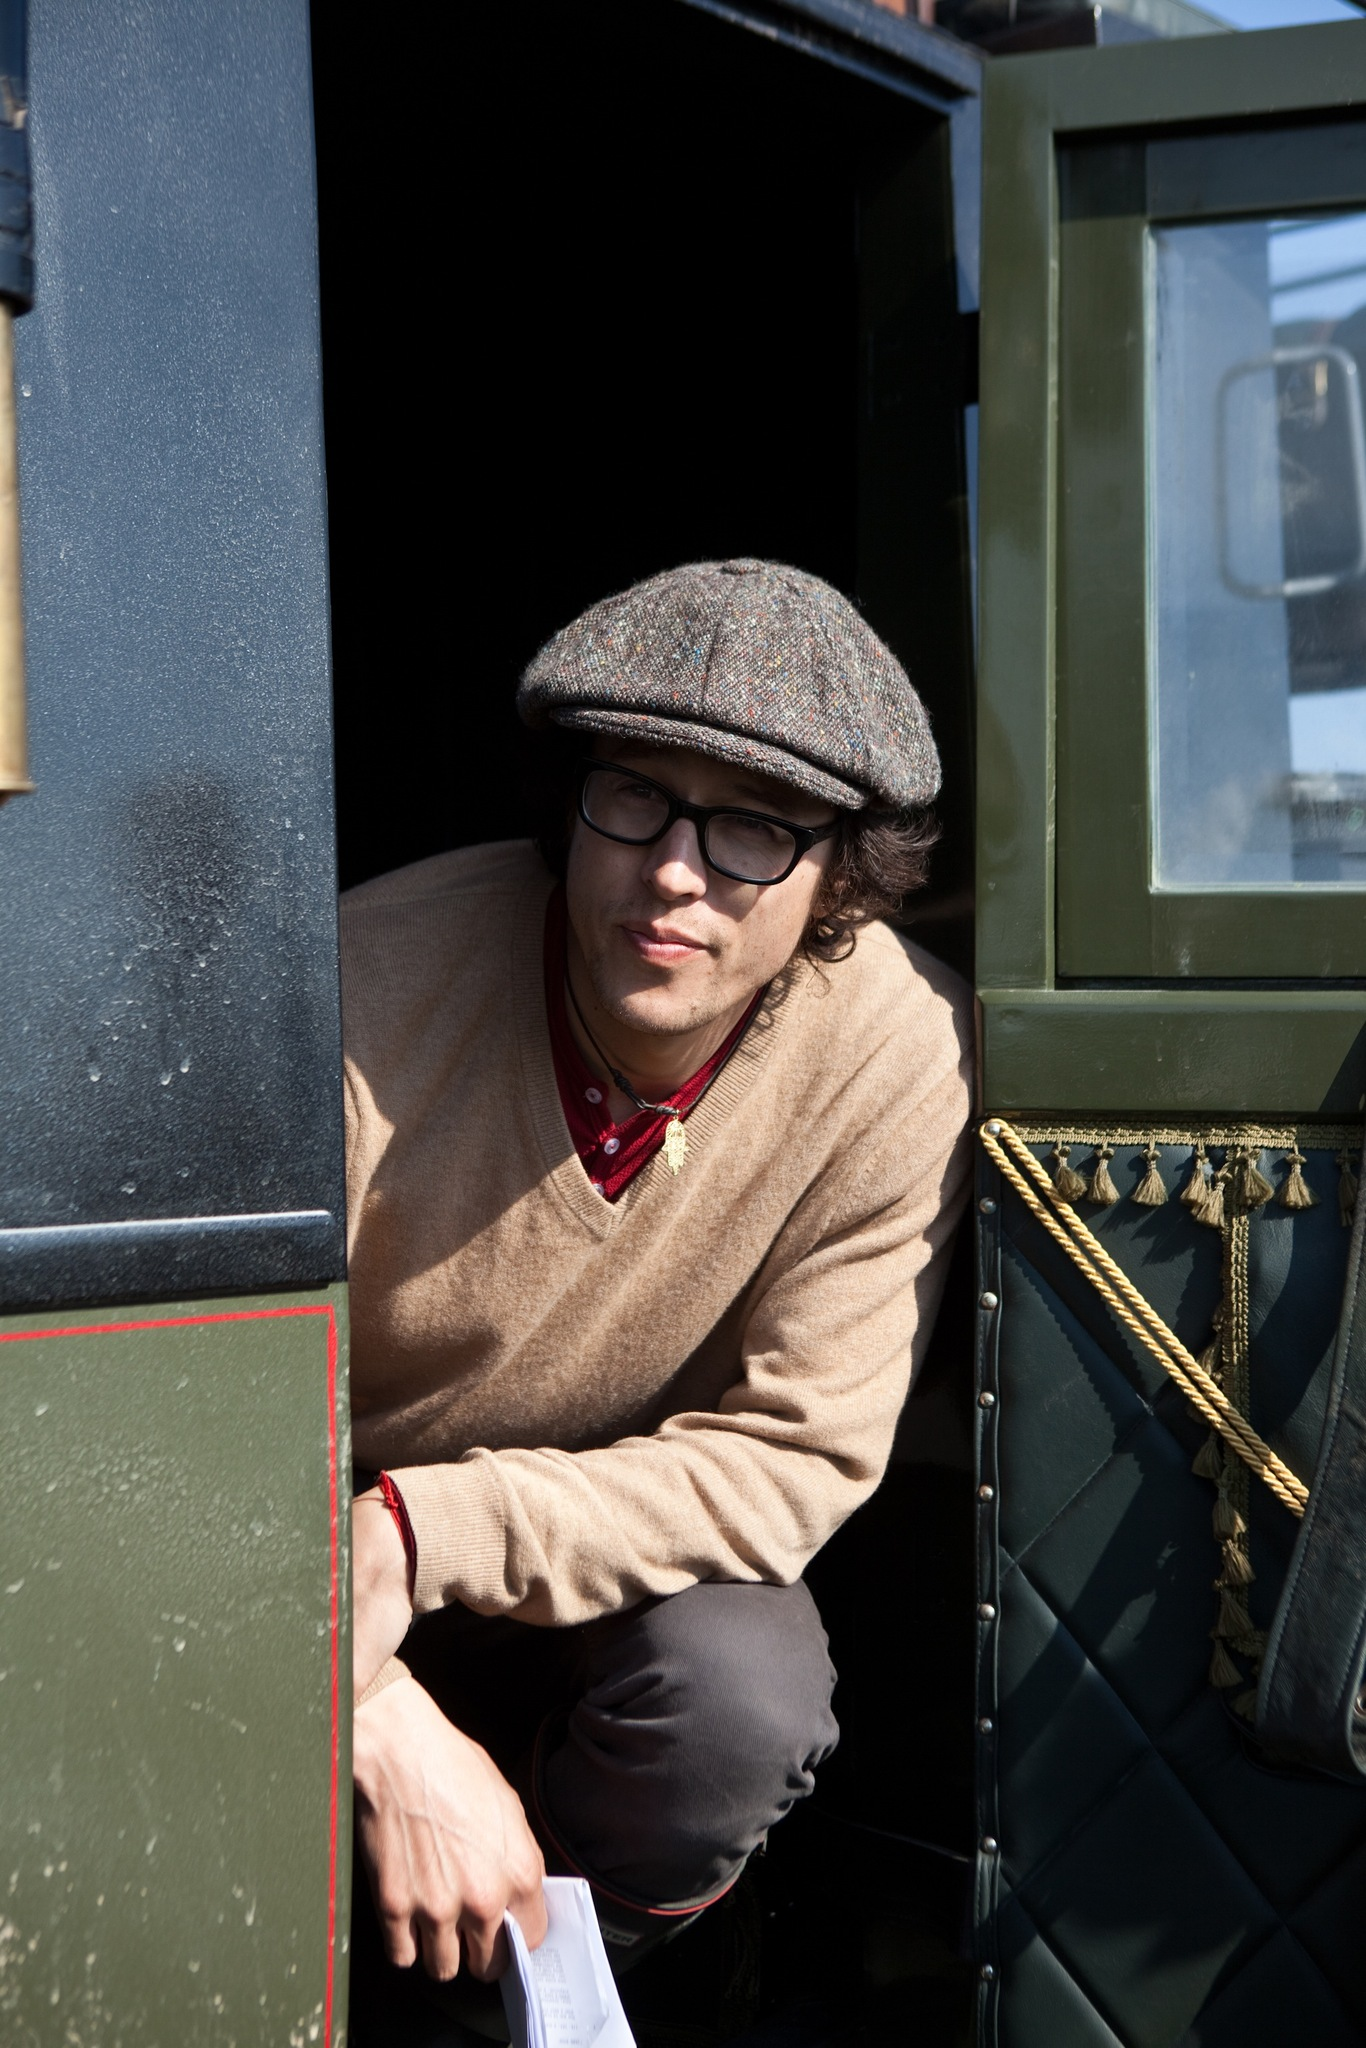 Cary Joji Fukunaga in Jane Eyre (2011)